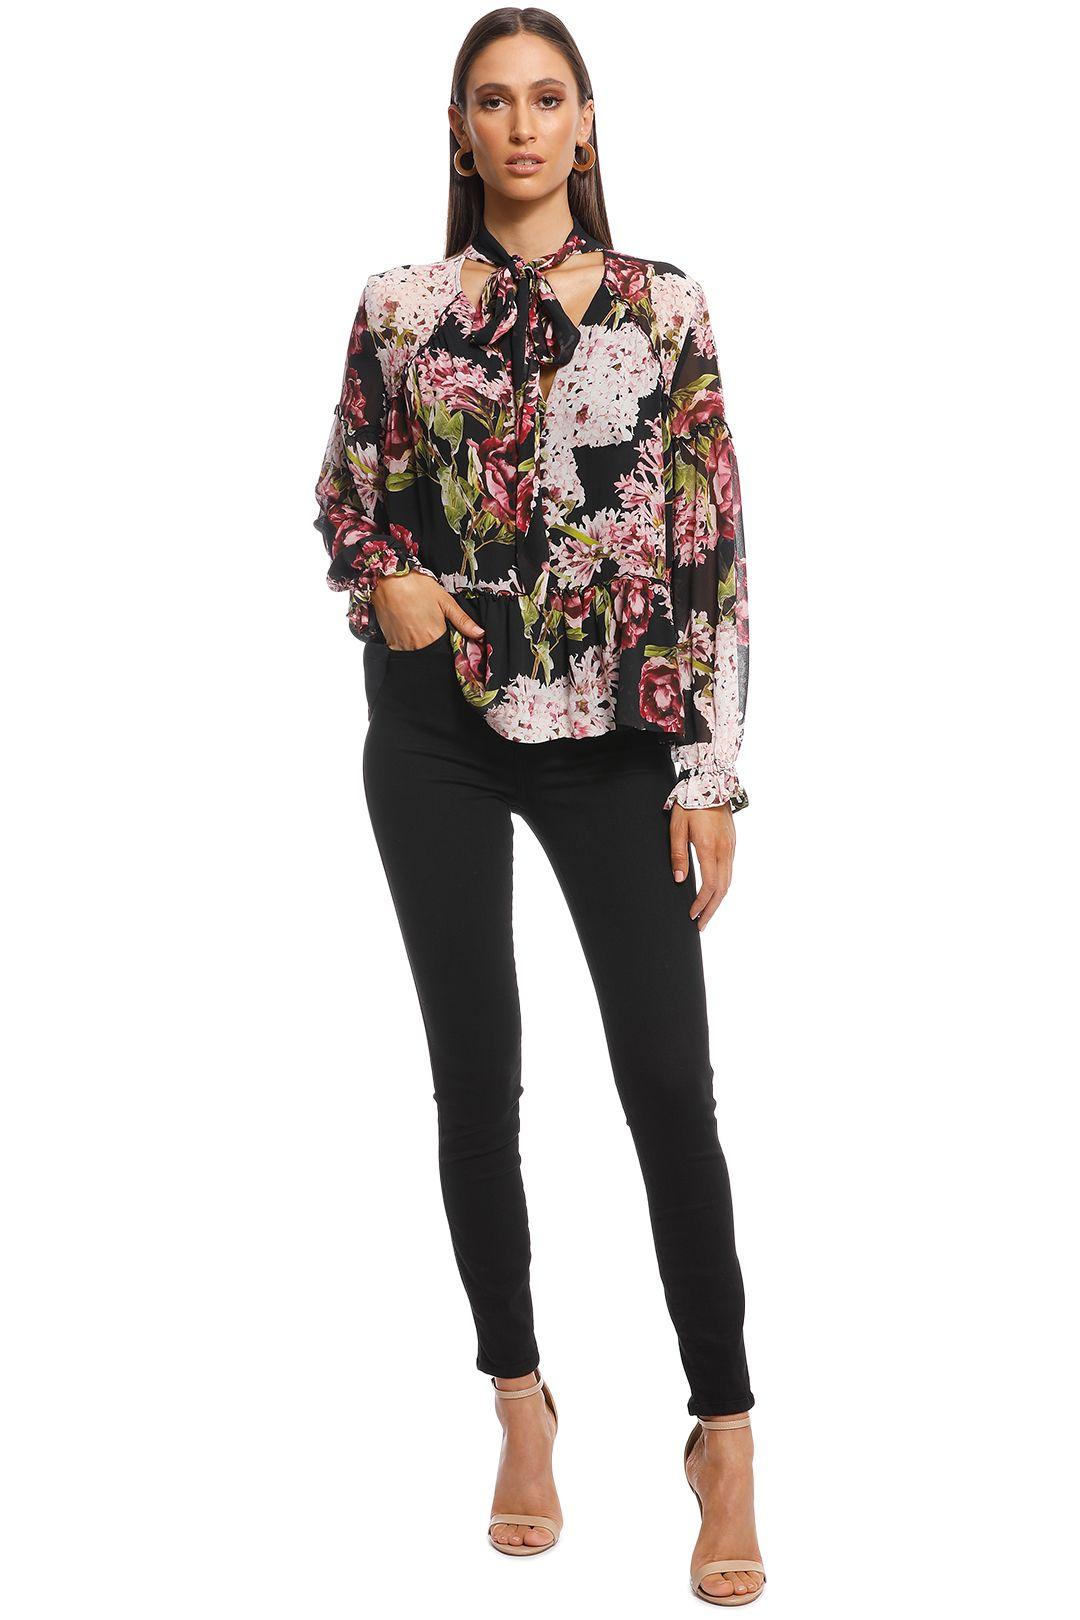 Nicholas - Heather Floral V-Neck Blouse - Black Floral - Front